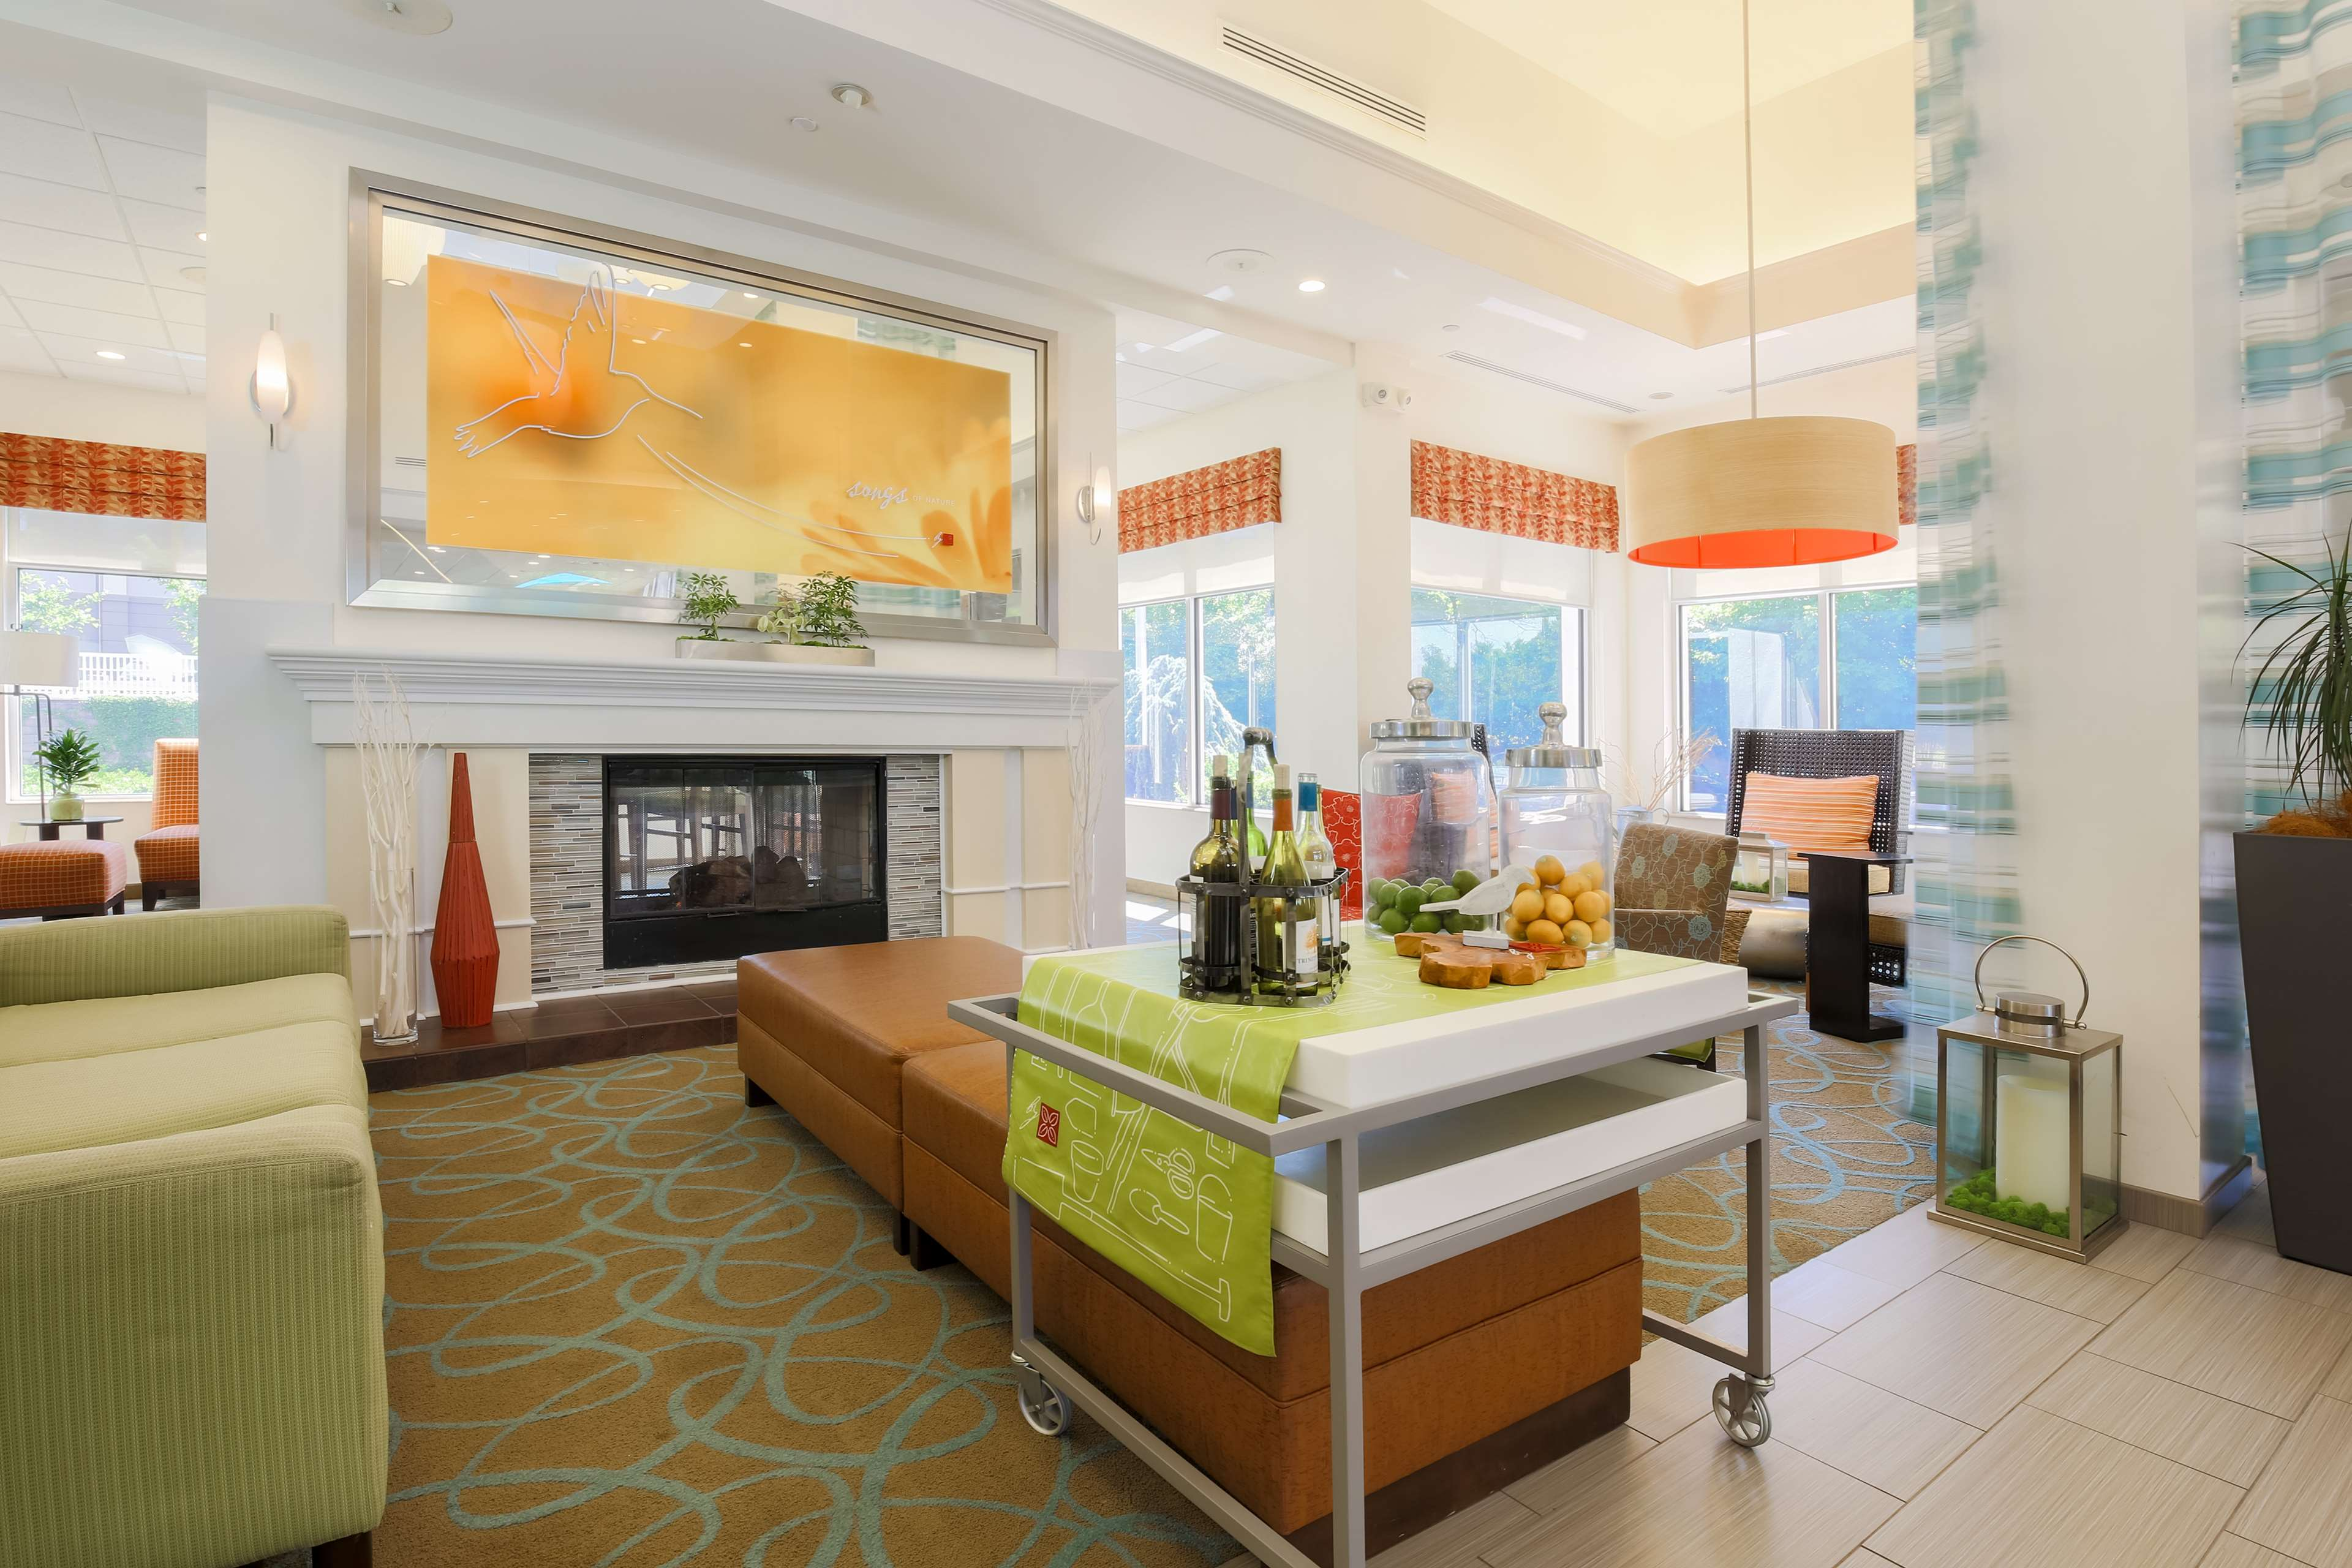 Hilton Garden Inn Nanuet image 5